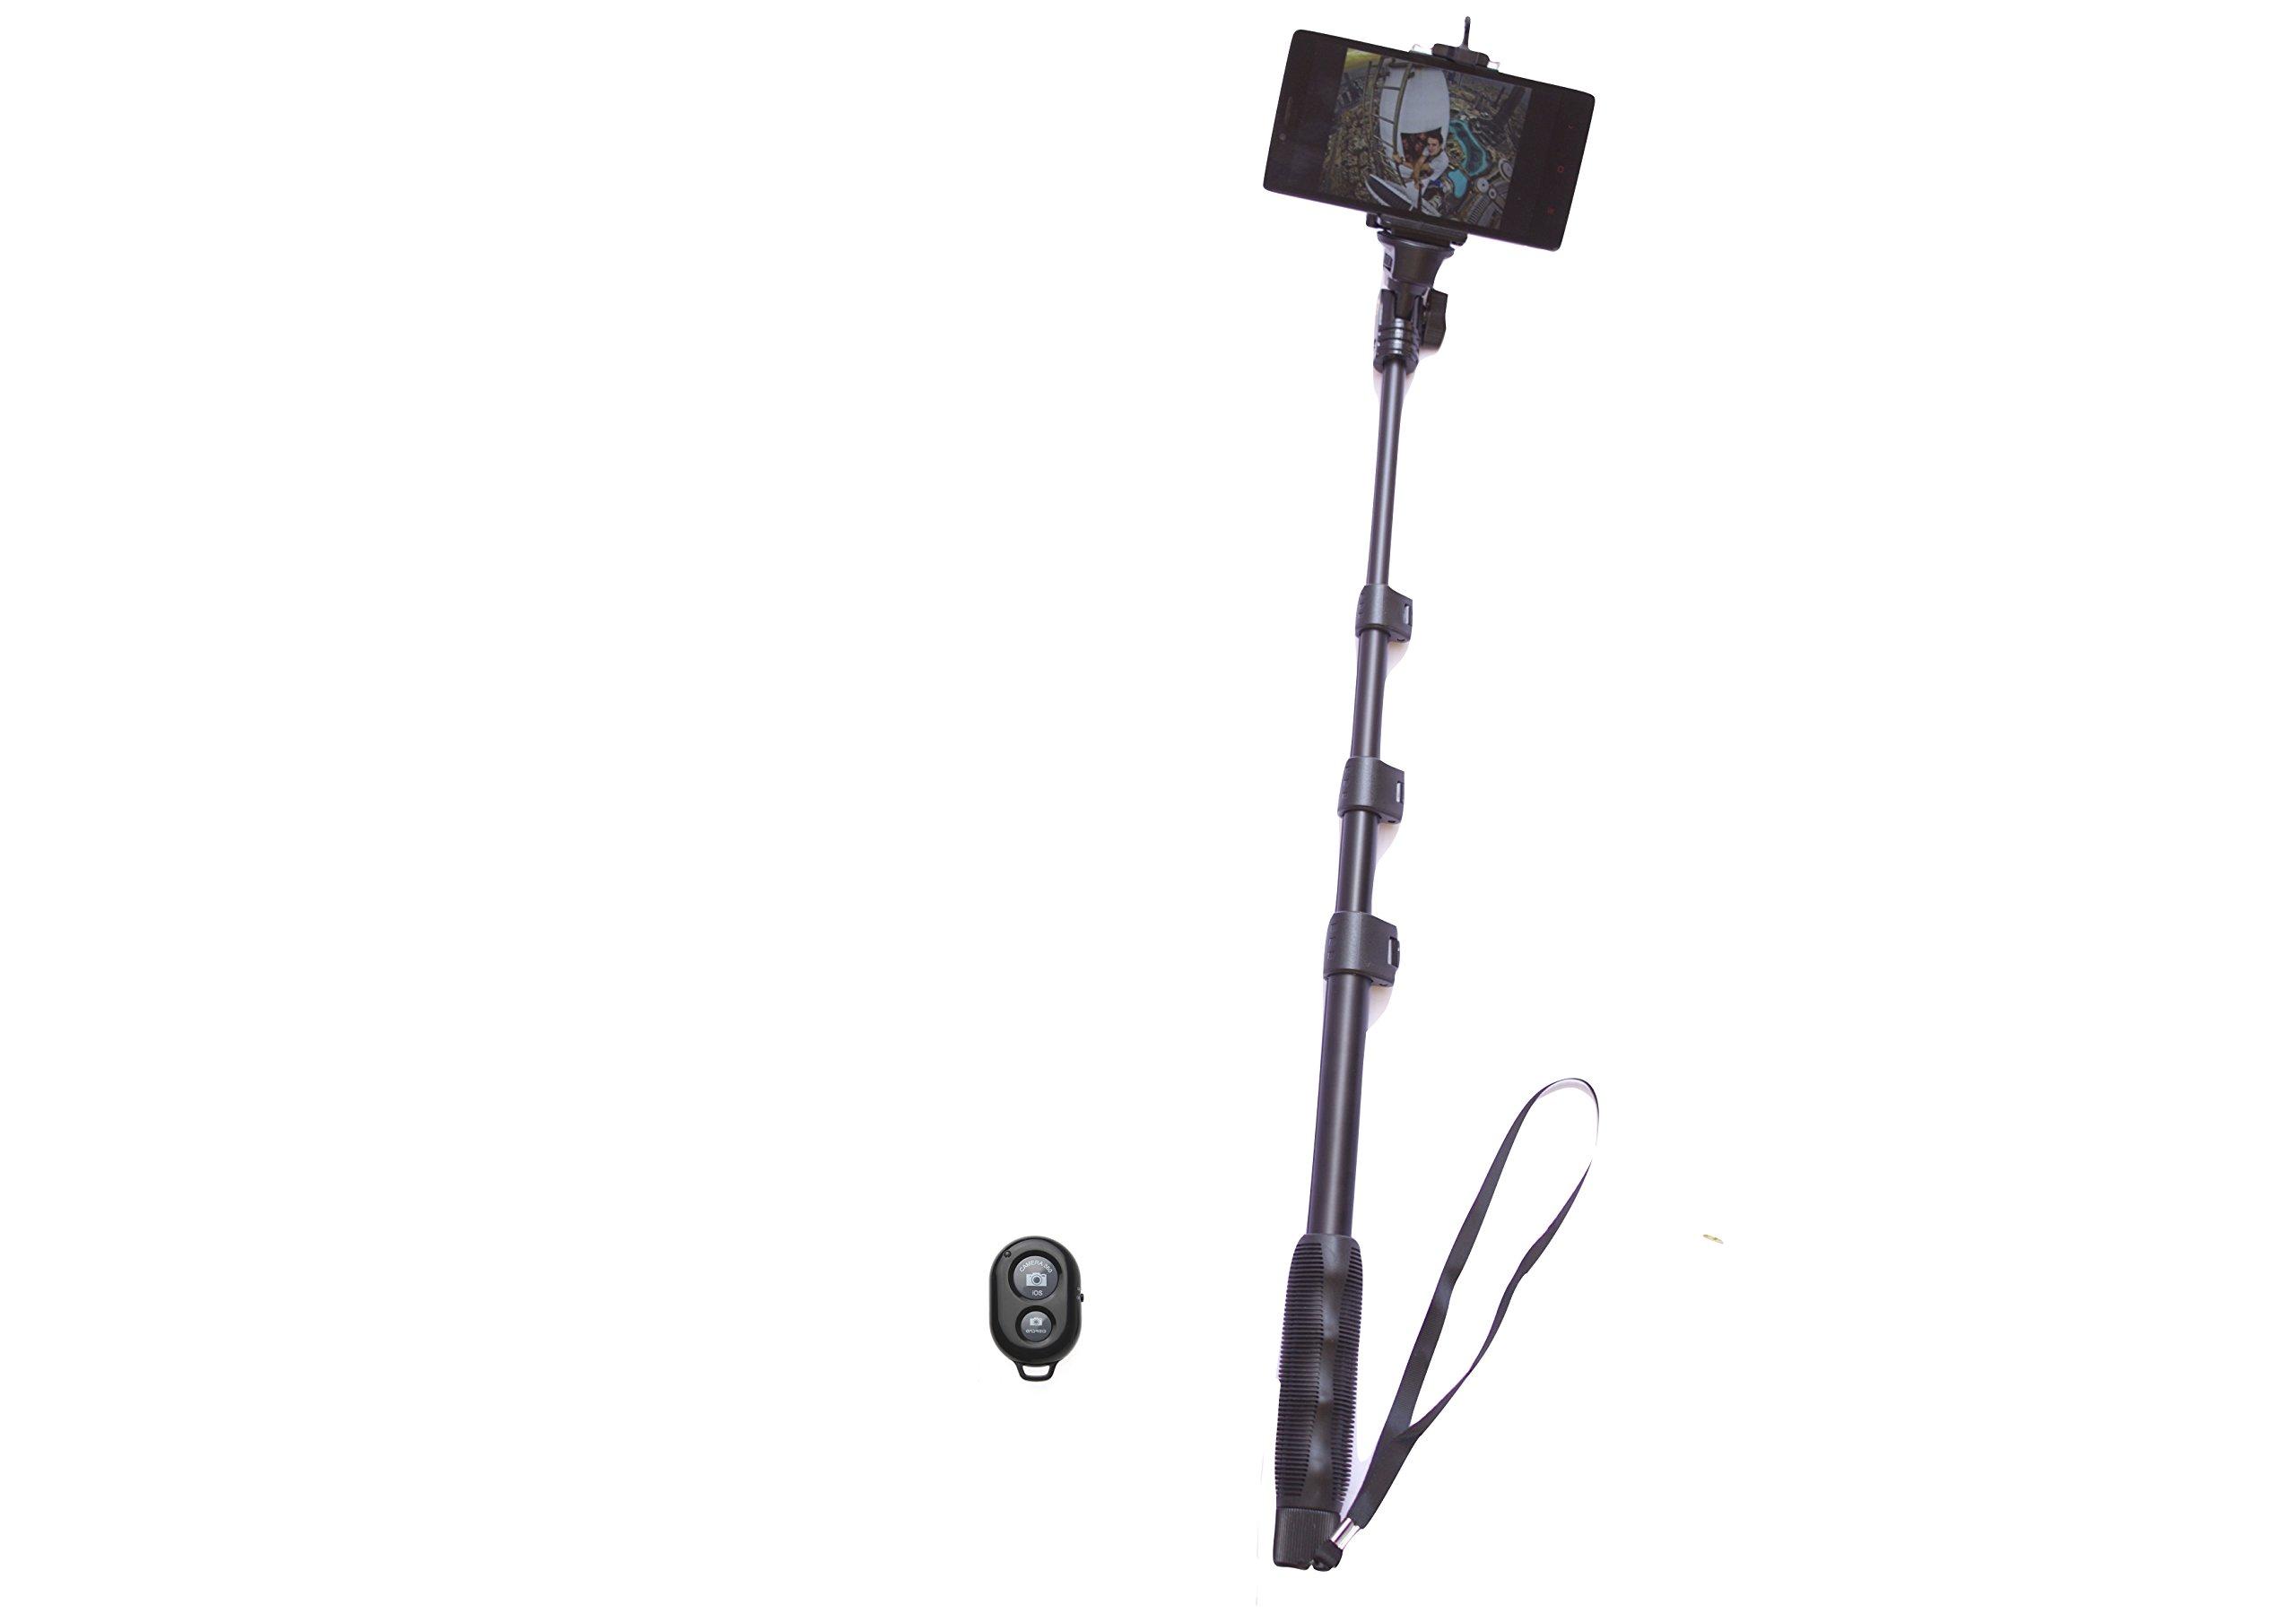 Yunteng GoPro Monopod Selfie Stick Pole 1.25m (Includes Mobile Phone Adapter)